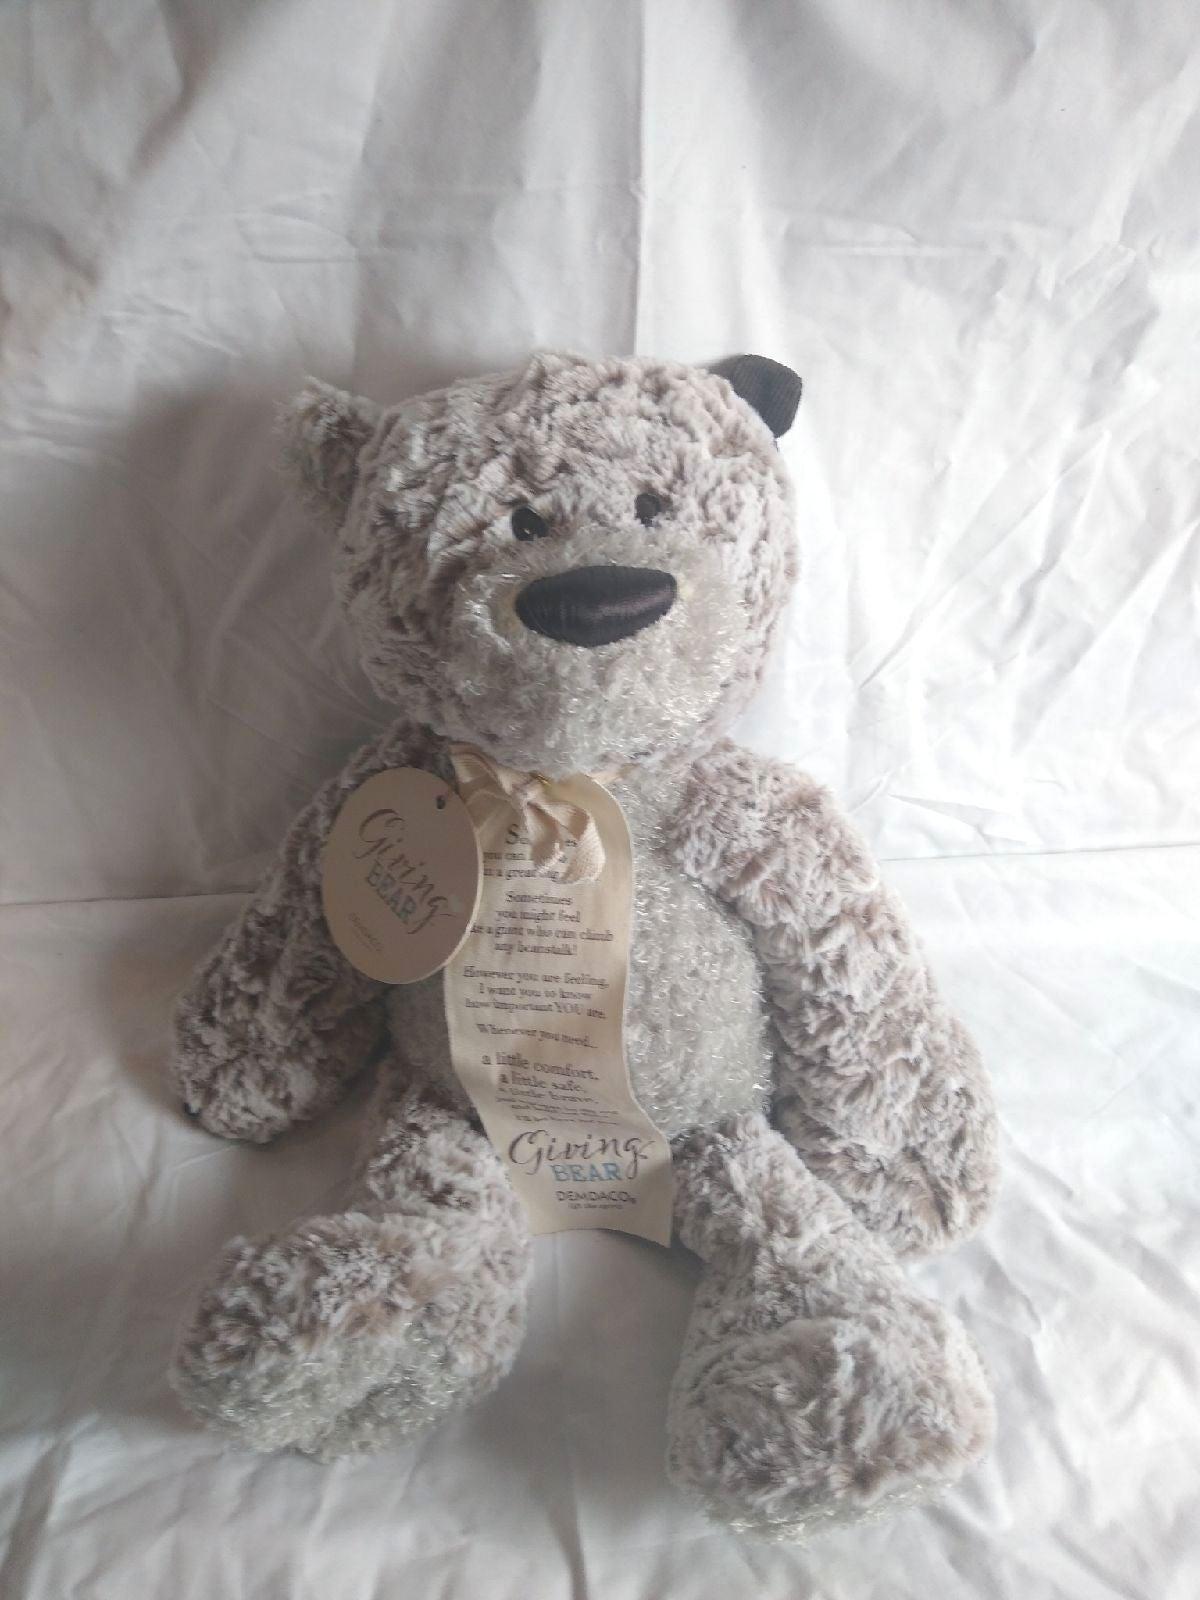 Demdaco Giving Bear Plush with tag